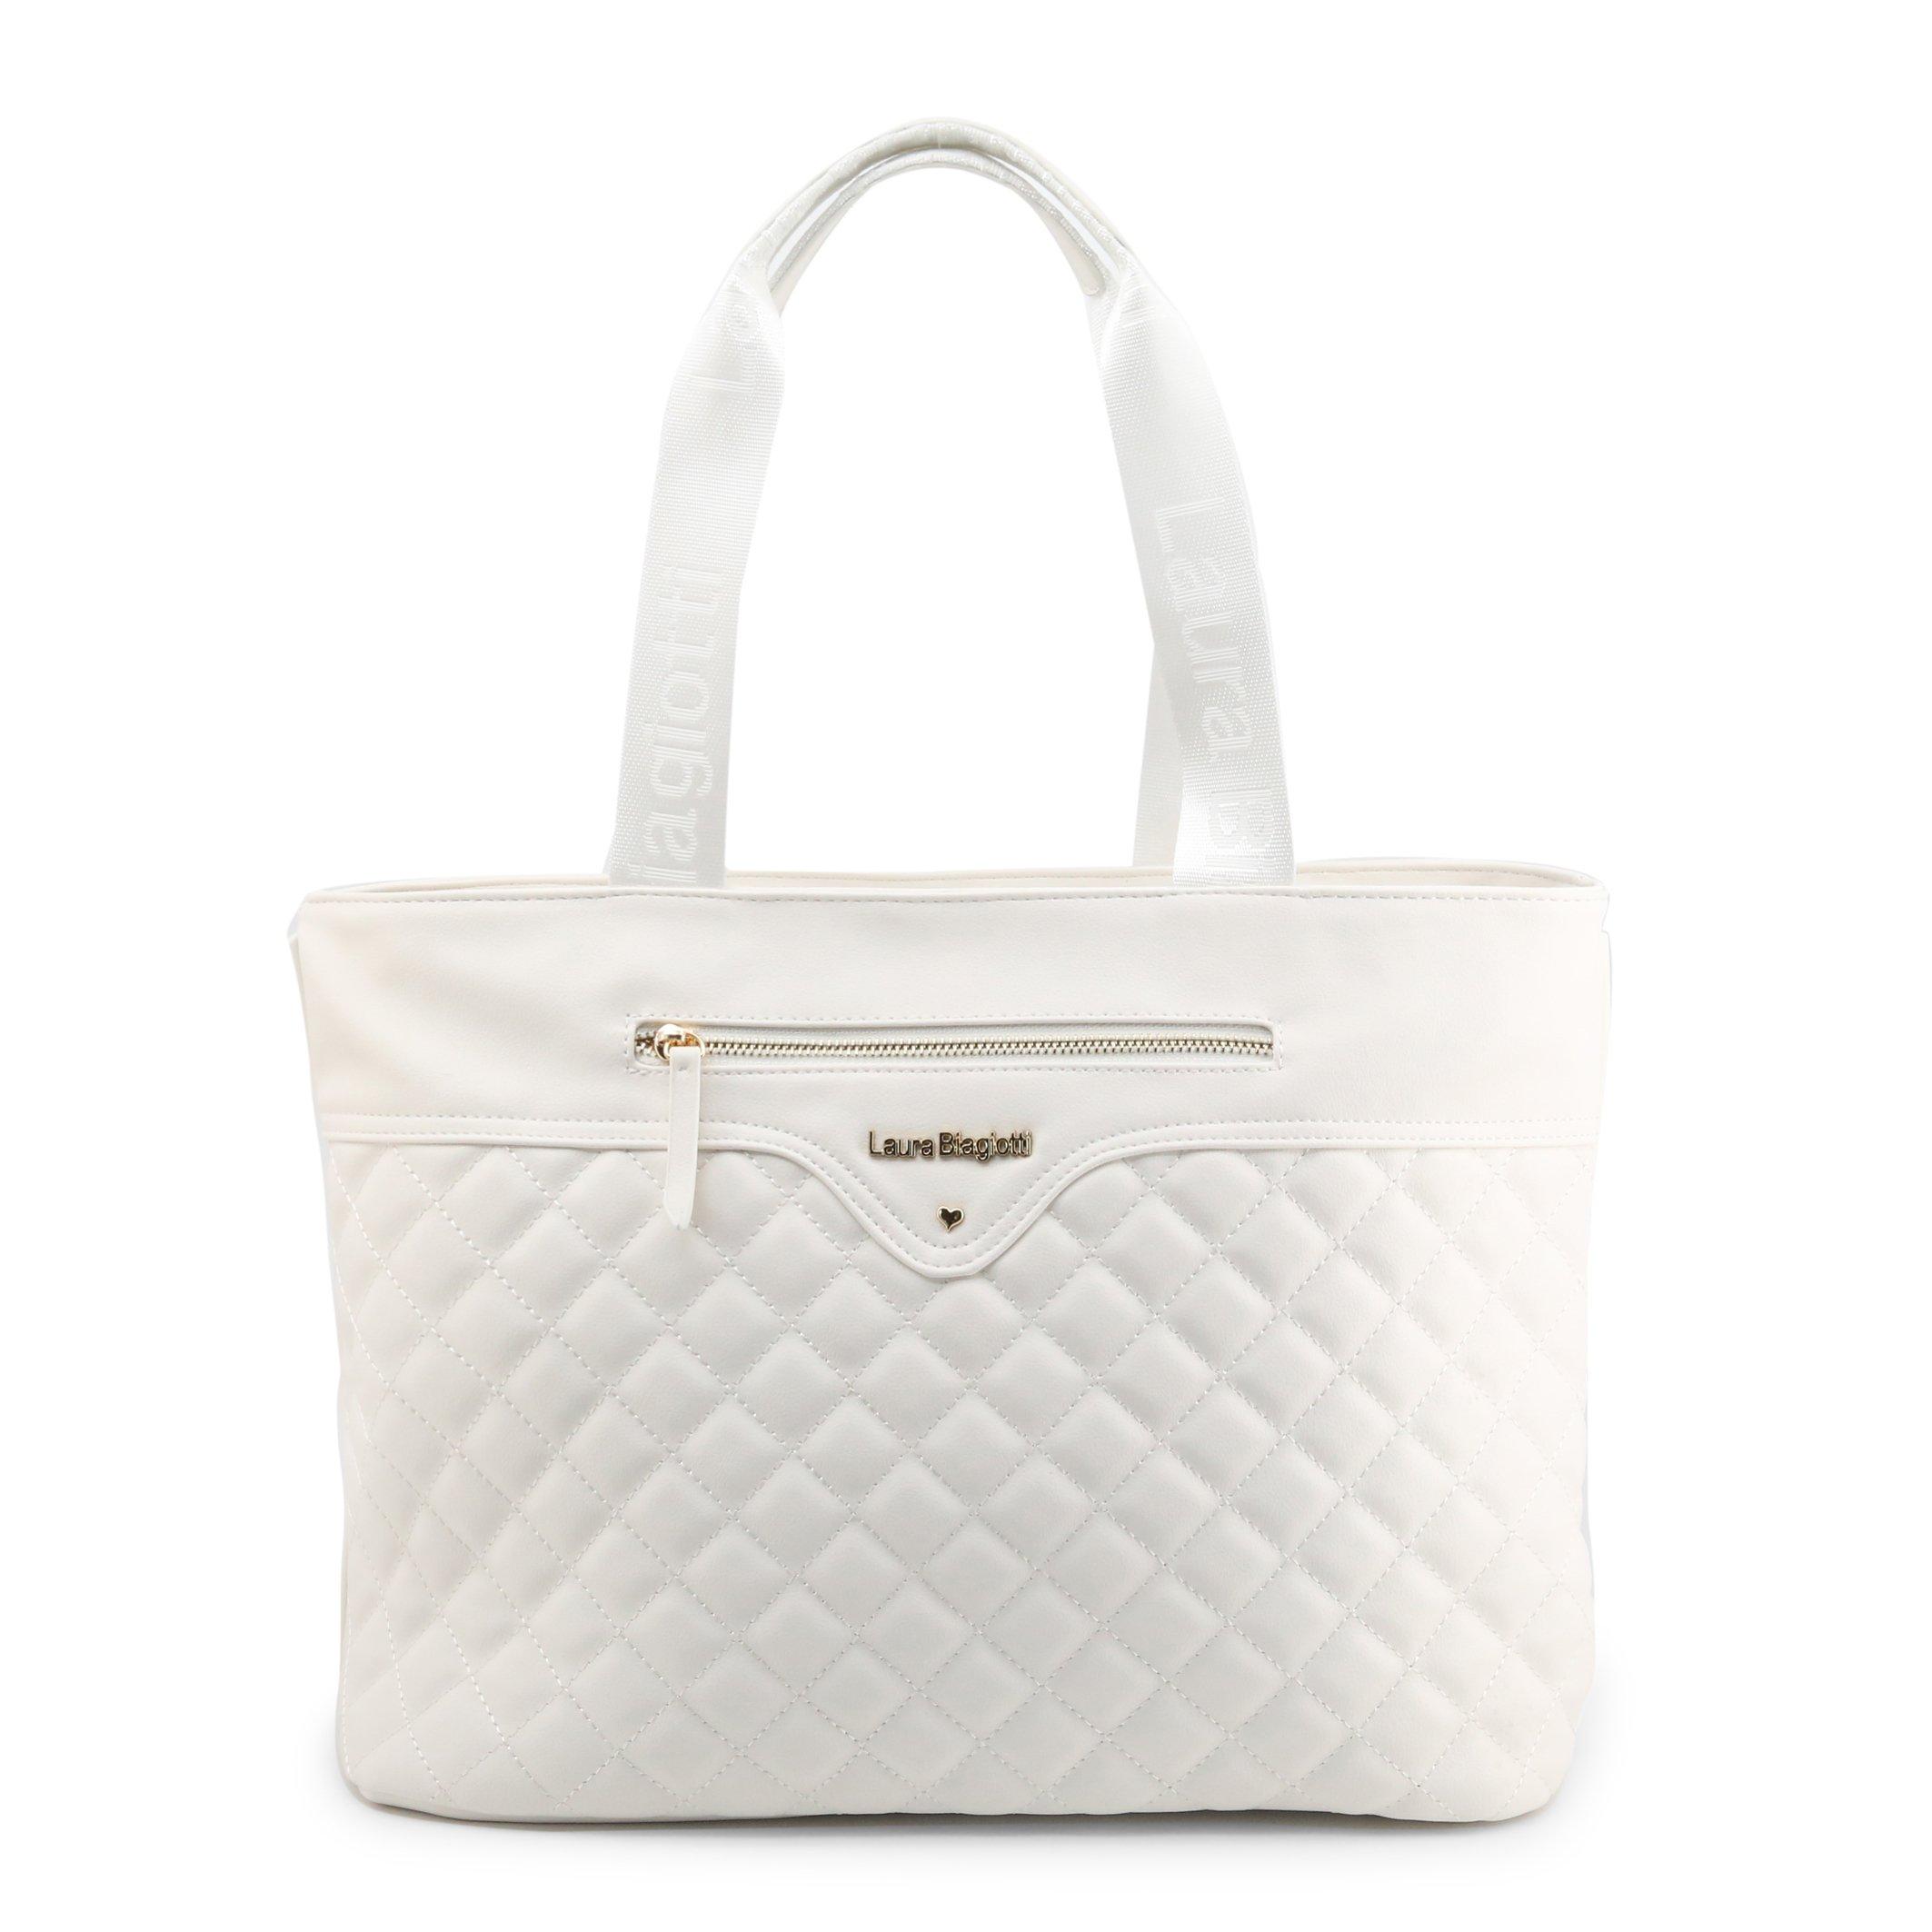 Laura Biagiotti Women's Shoulder Bag Various Colours Perkins-102-6 - white NOSIZE